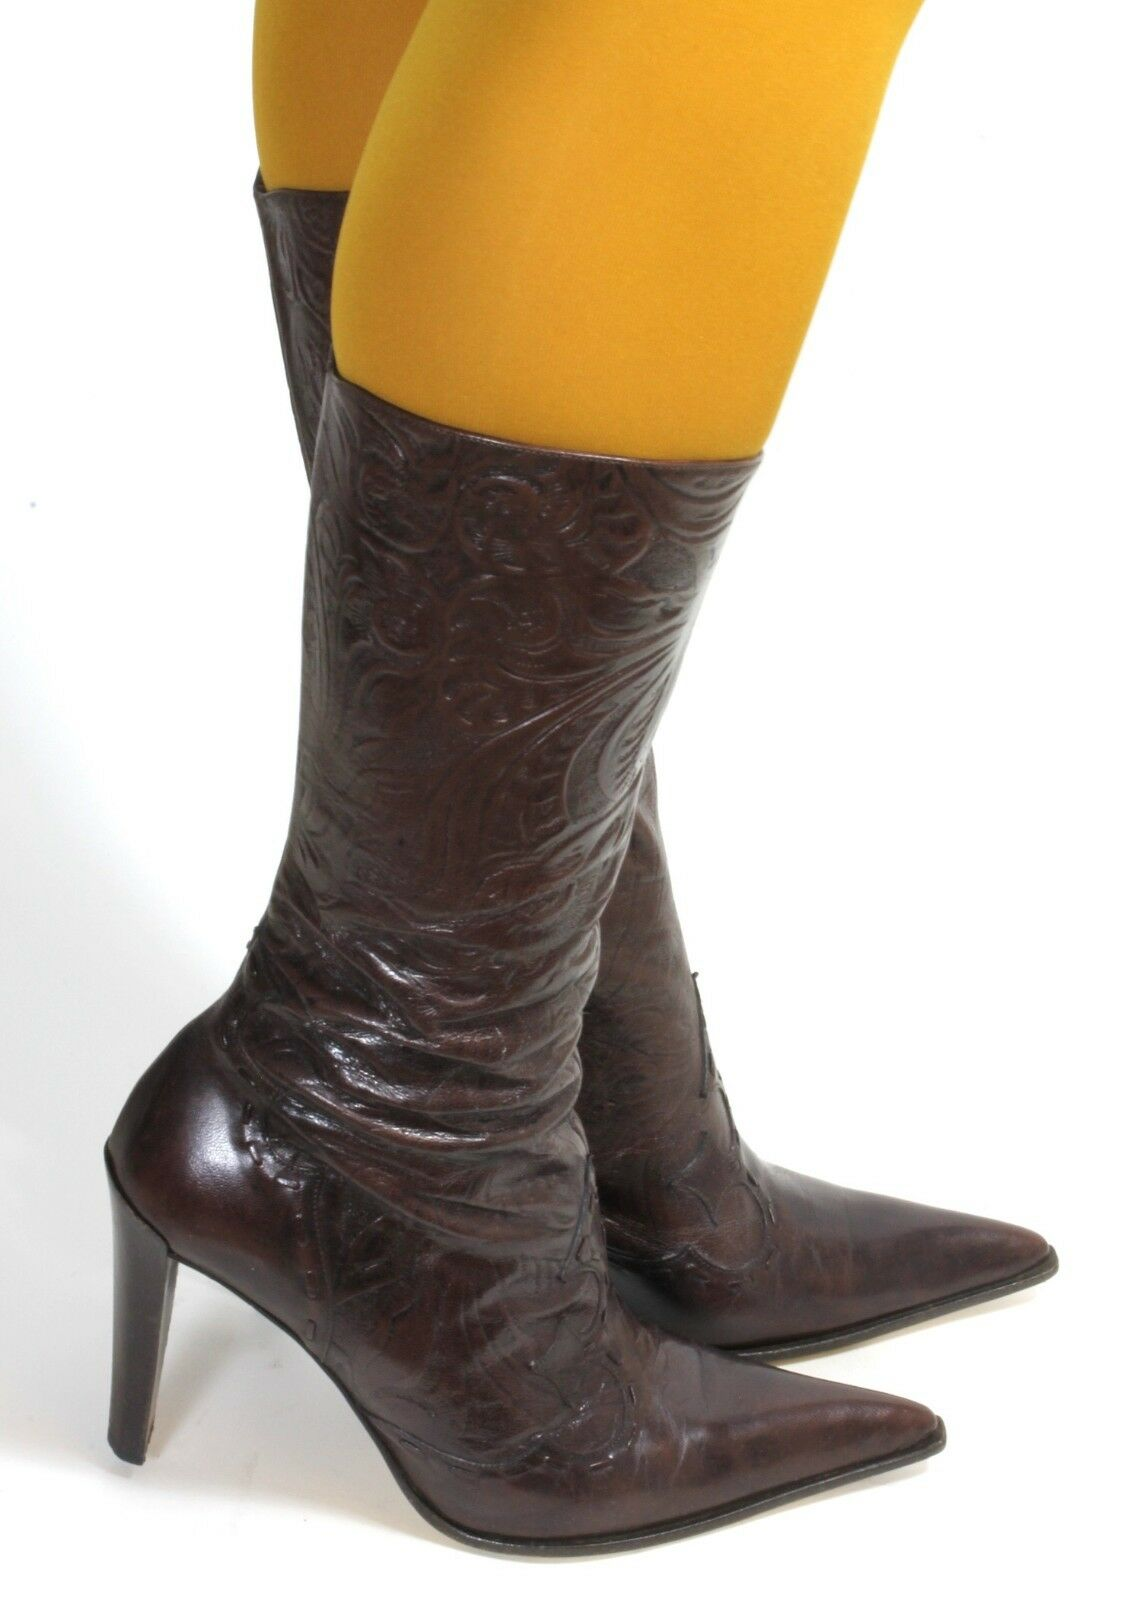 387ec4bb82bfa2 Westernstiefel Westernstiefel Westernstiefel Cowboystiefel Texas Stiefel  High Heels Zipper Braun Damenstiefel 38